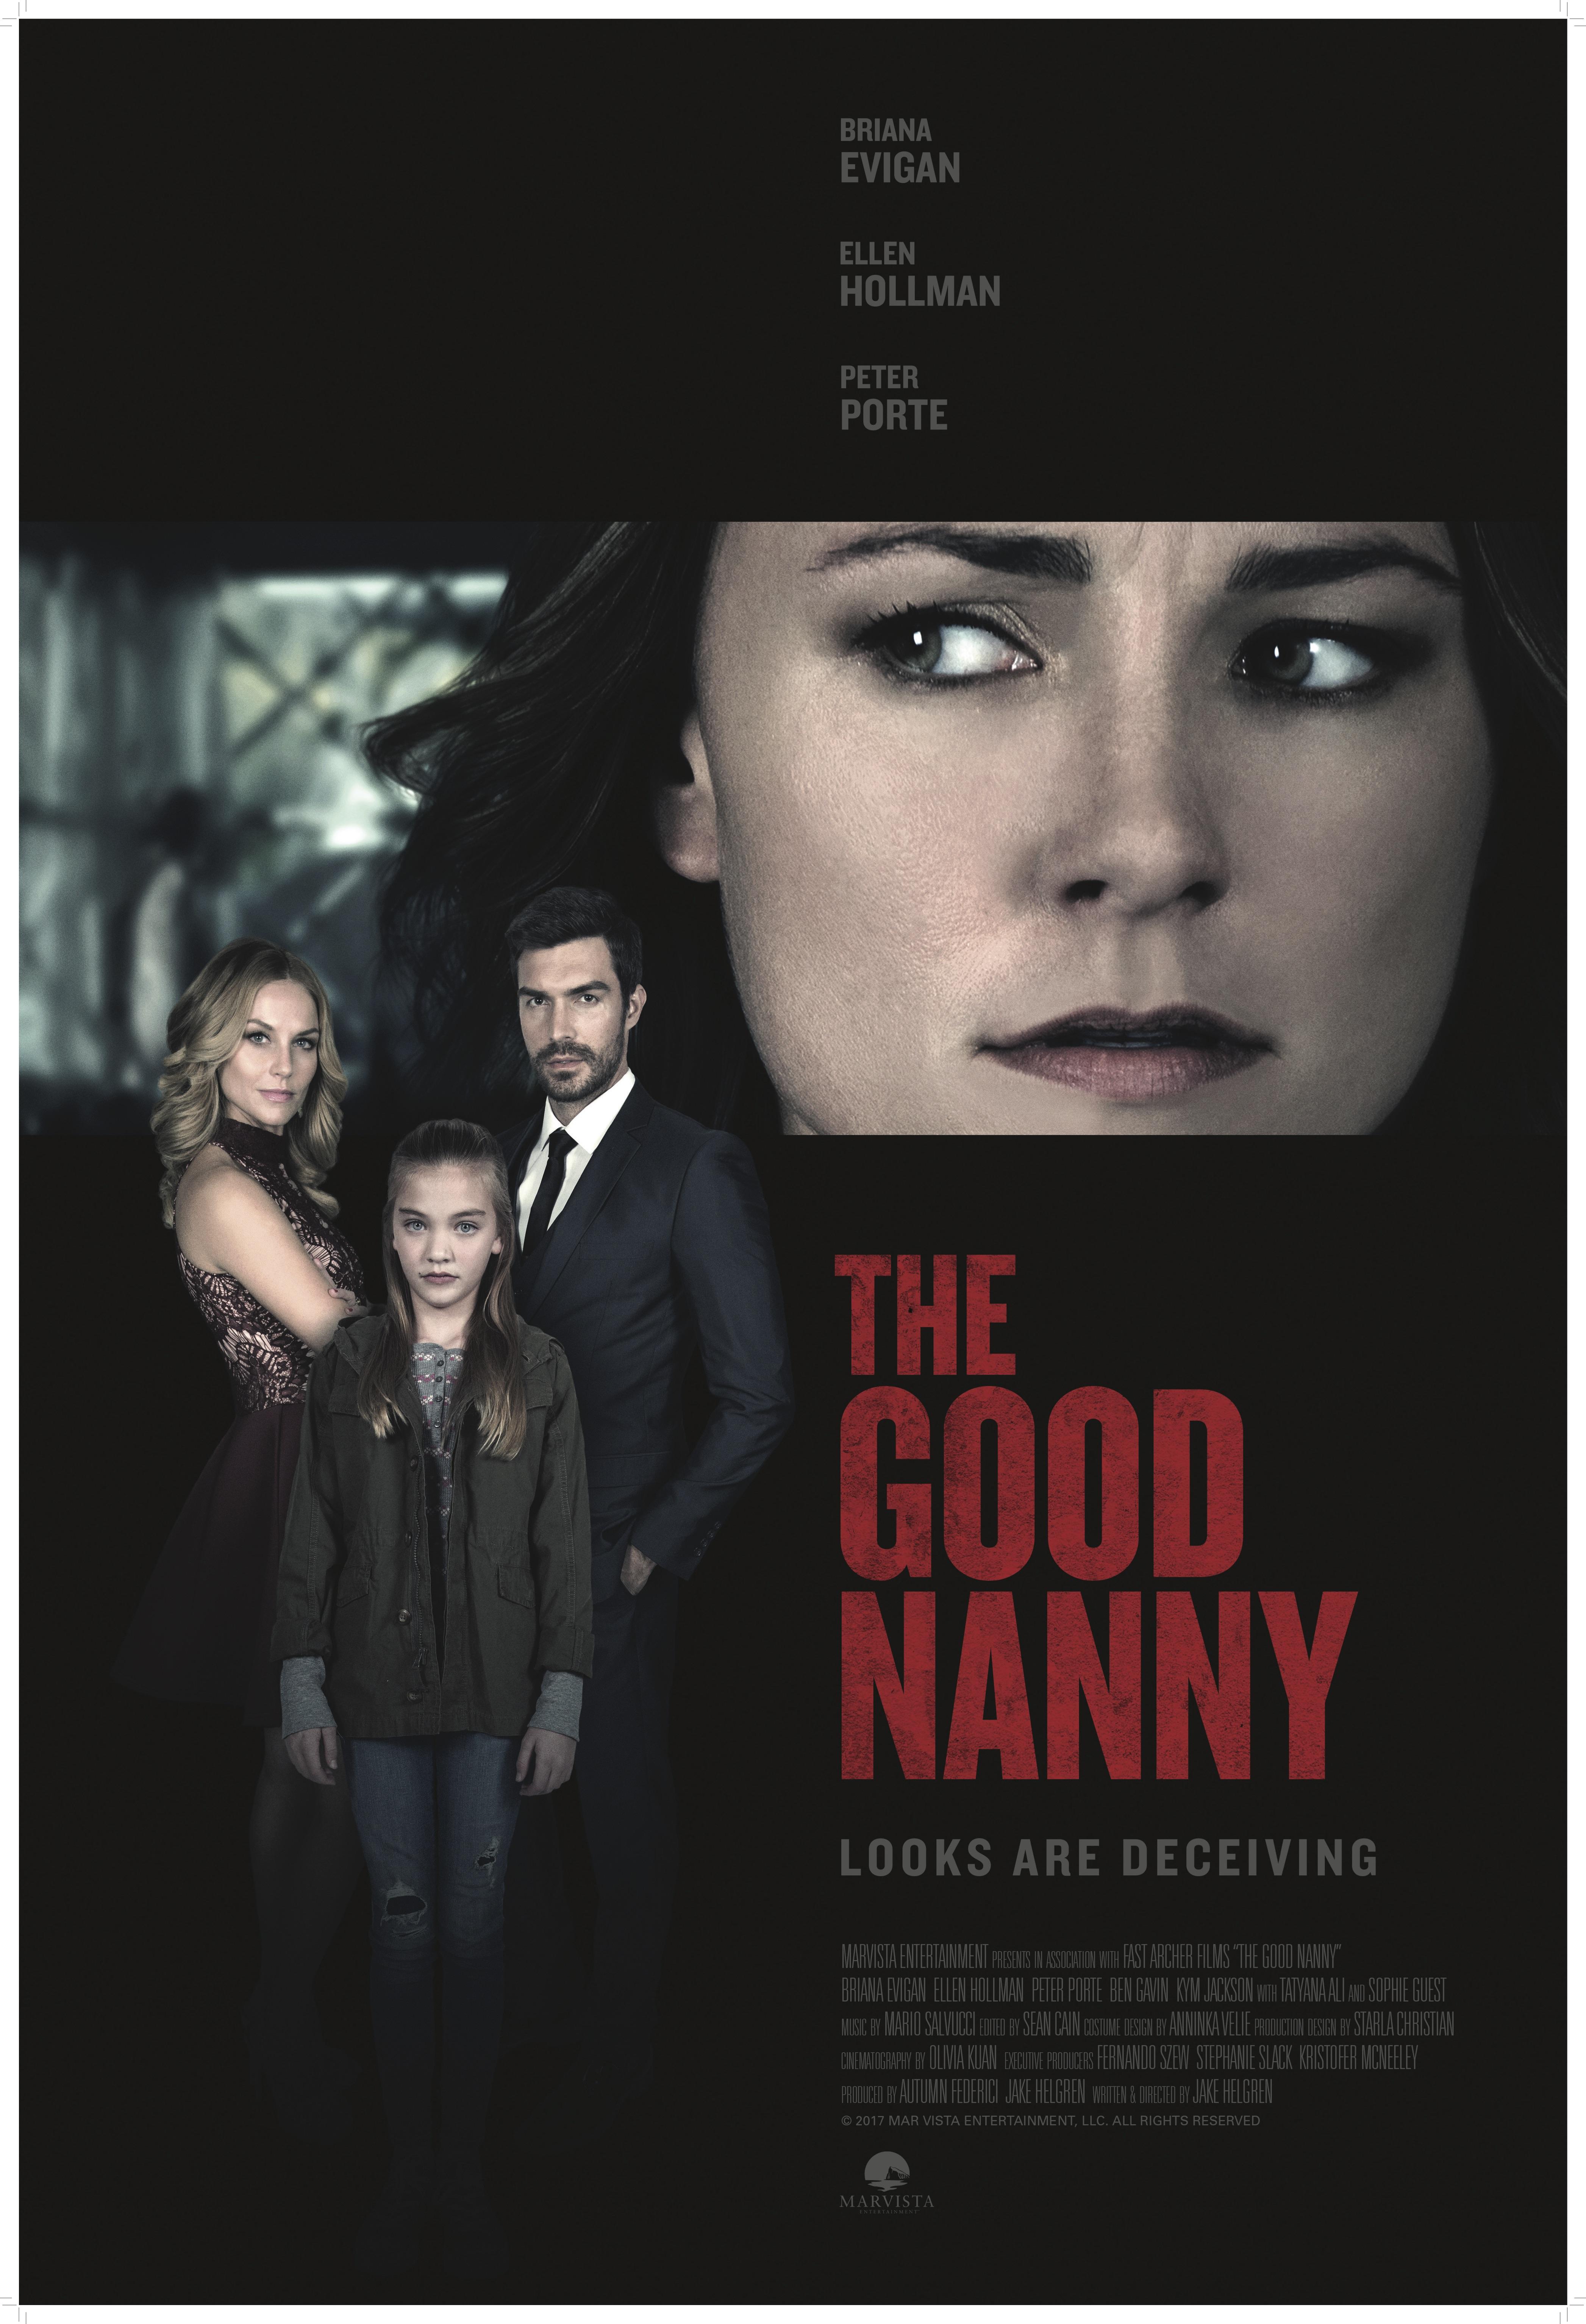 The Good Nanny TV Movie 2017 IMDb